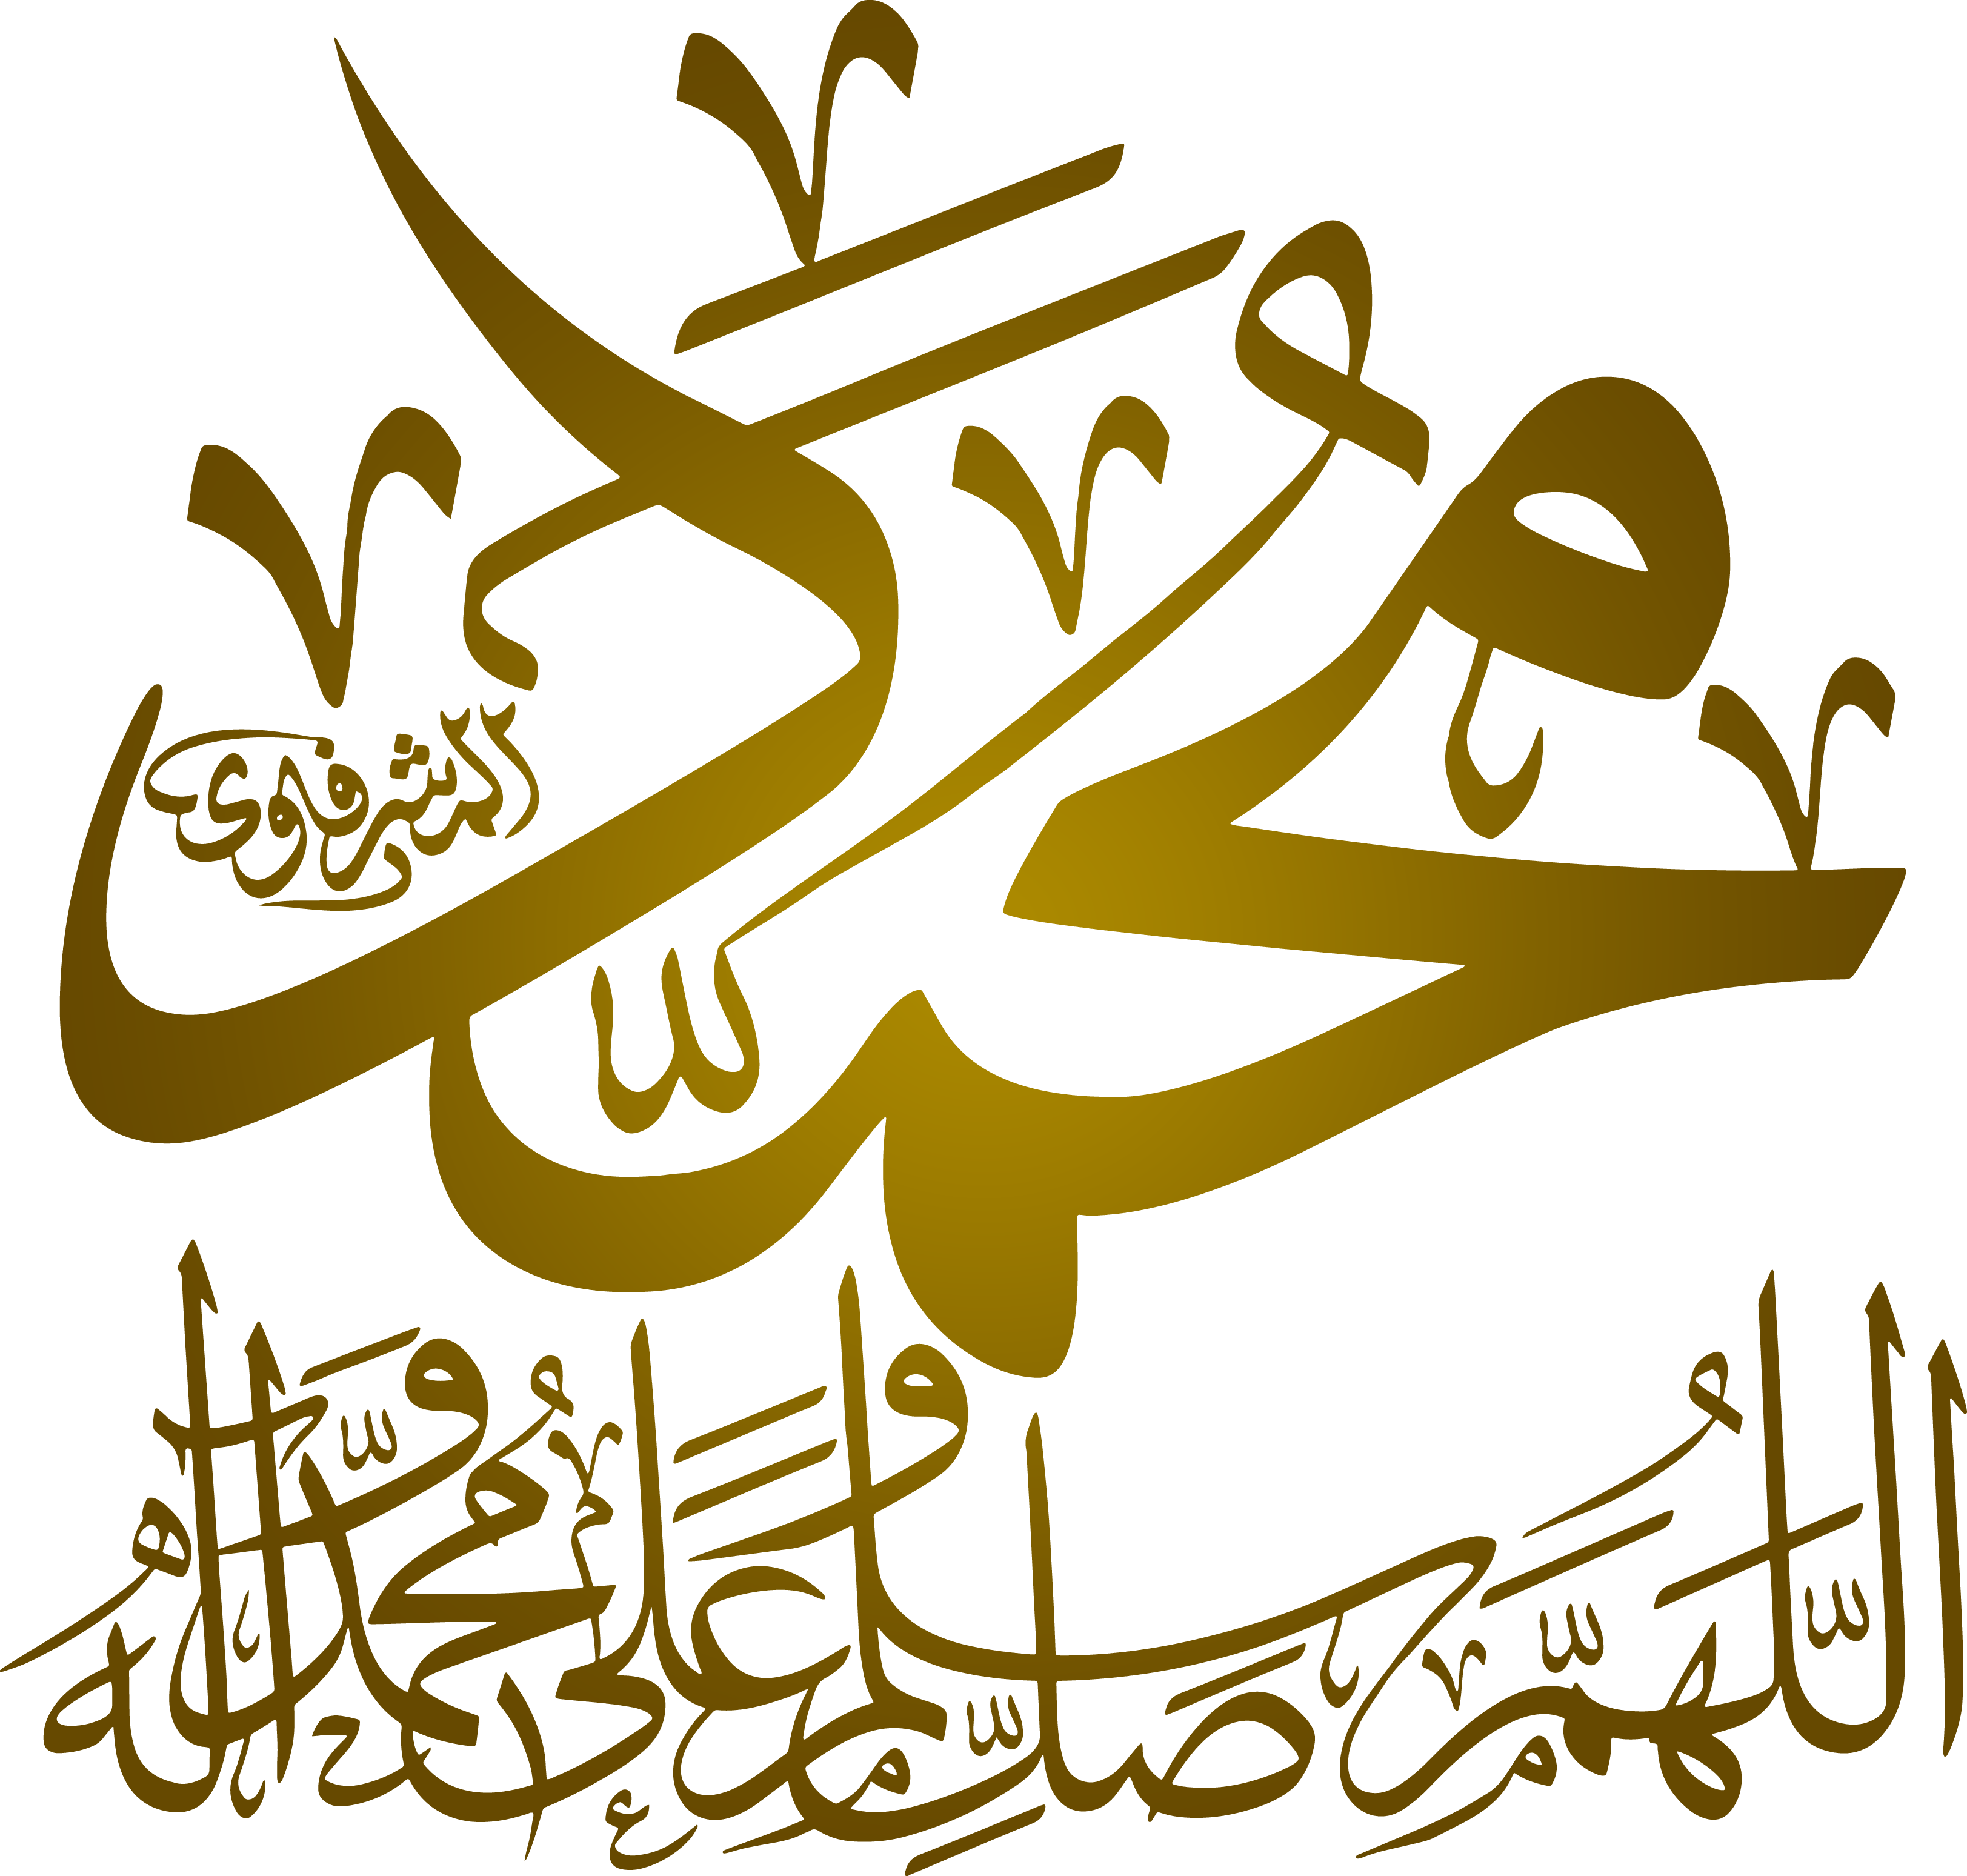 Pin By Ahmed Alabdullah On اللهم صل على محمد و آل محمد Arabic Calligraphy Islam Art